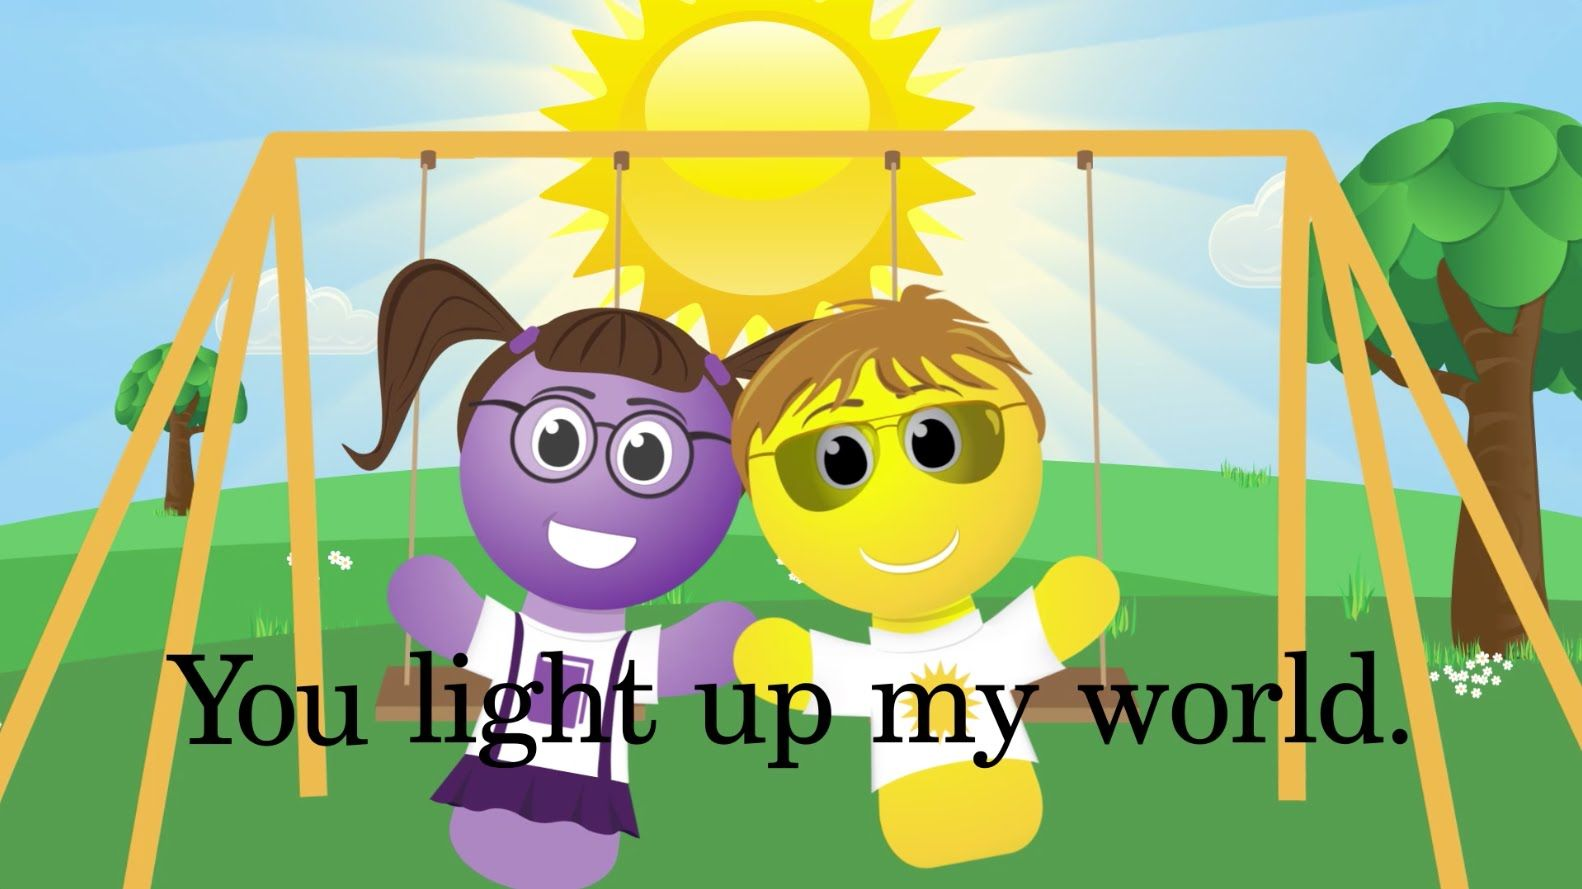 baa1b919a2f4a42345f86f5cb05dbde8 - Sight Word Song For Kindergarten